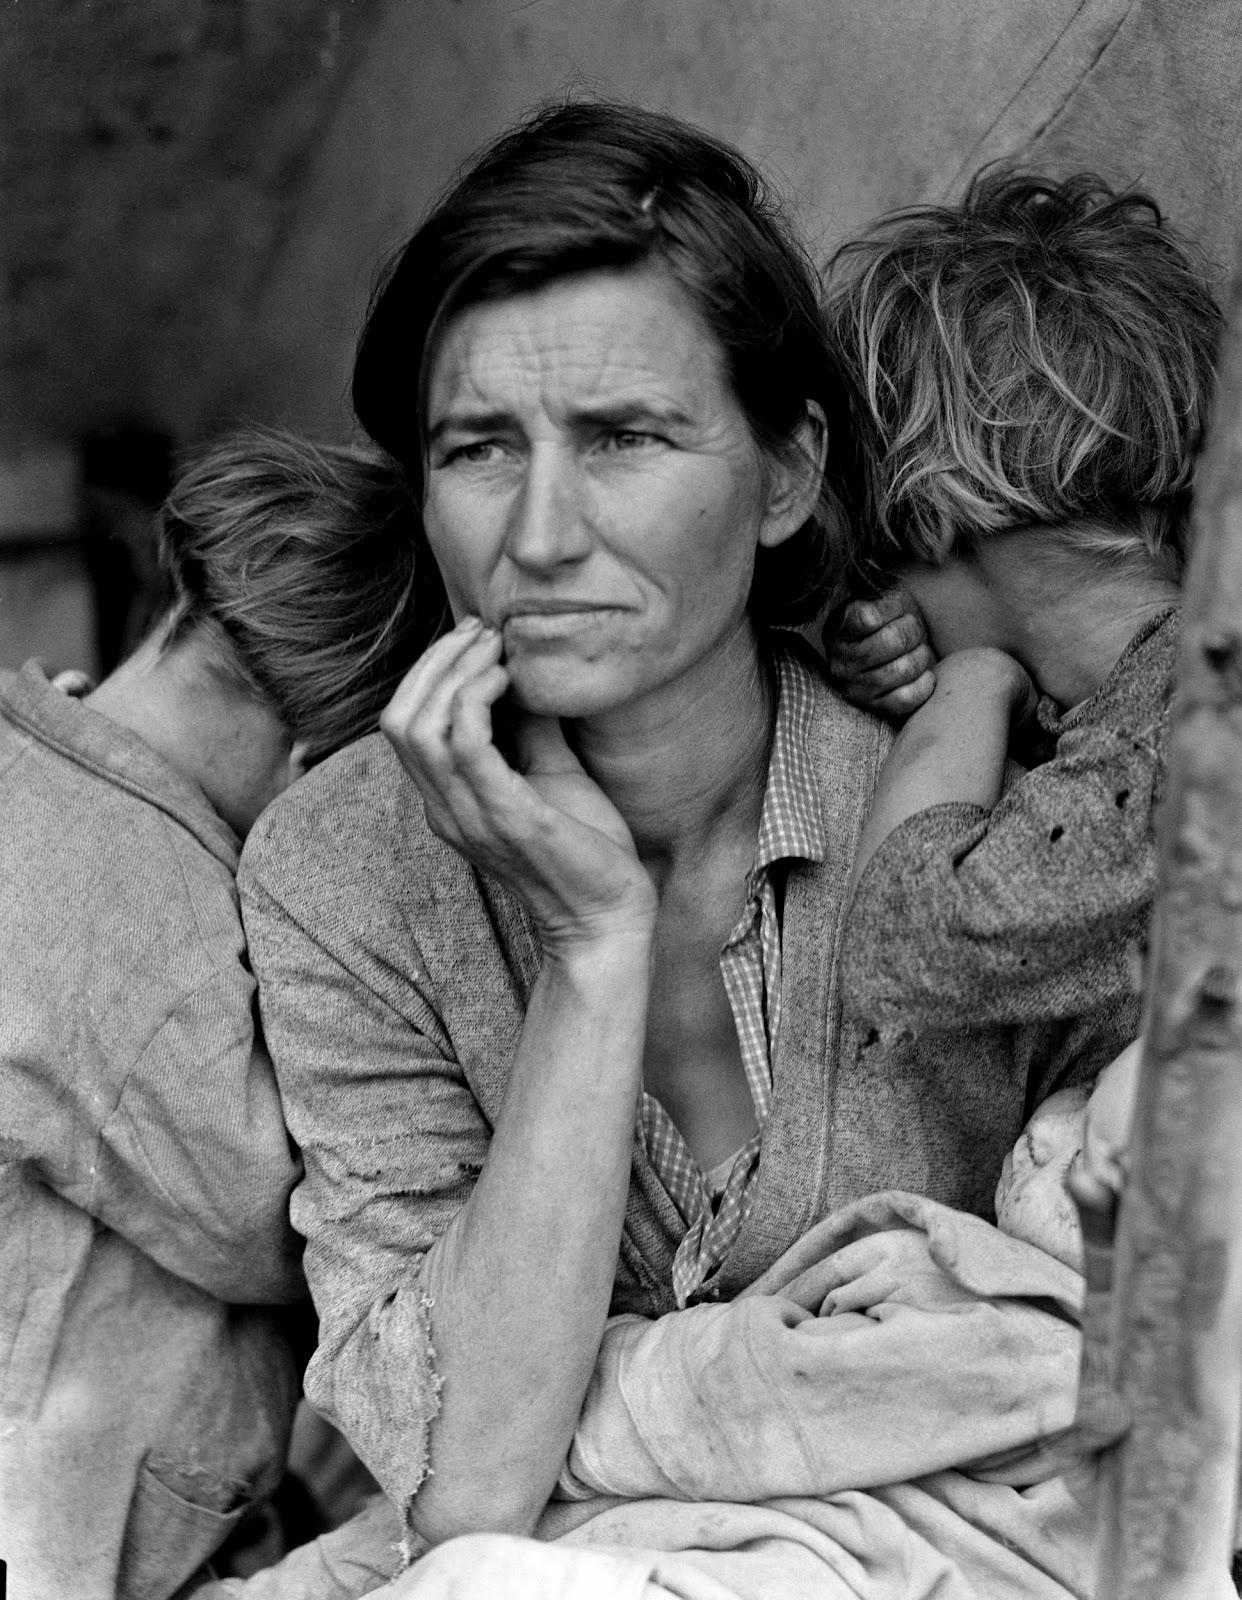 History in Photos: Dorothea Lange - Migrants